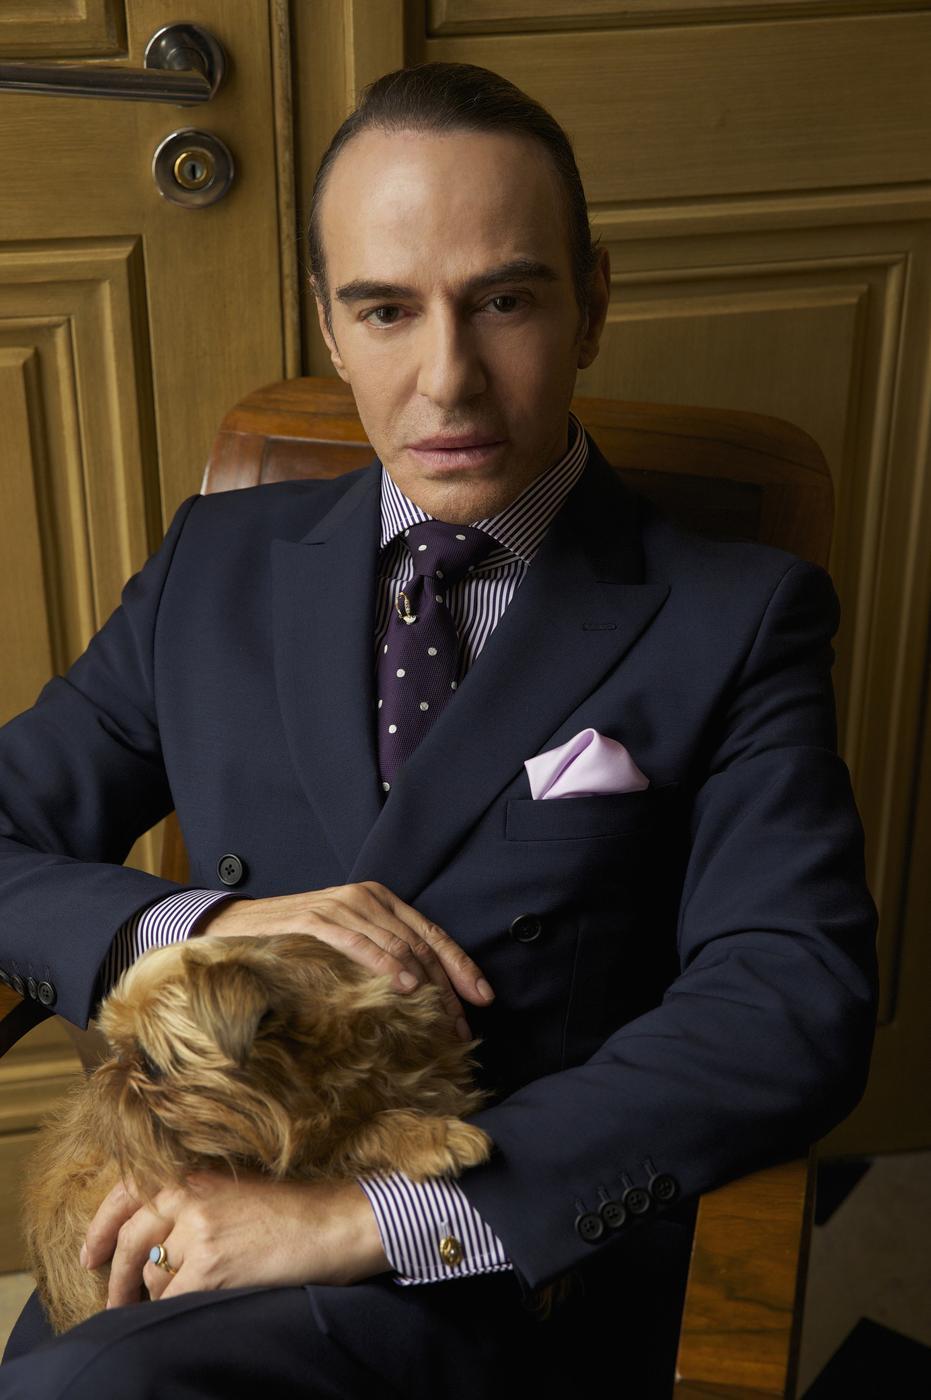 John Galliano looks to restart his fashion career three years after anti-Semitic rant, with head role at Mason Martin Margiela